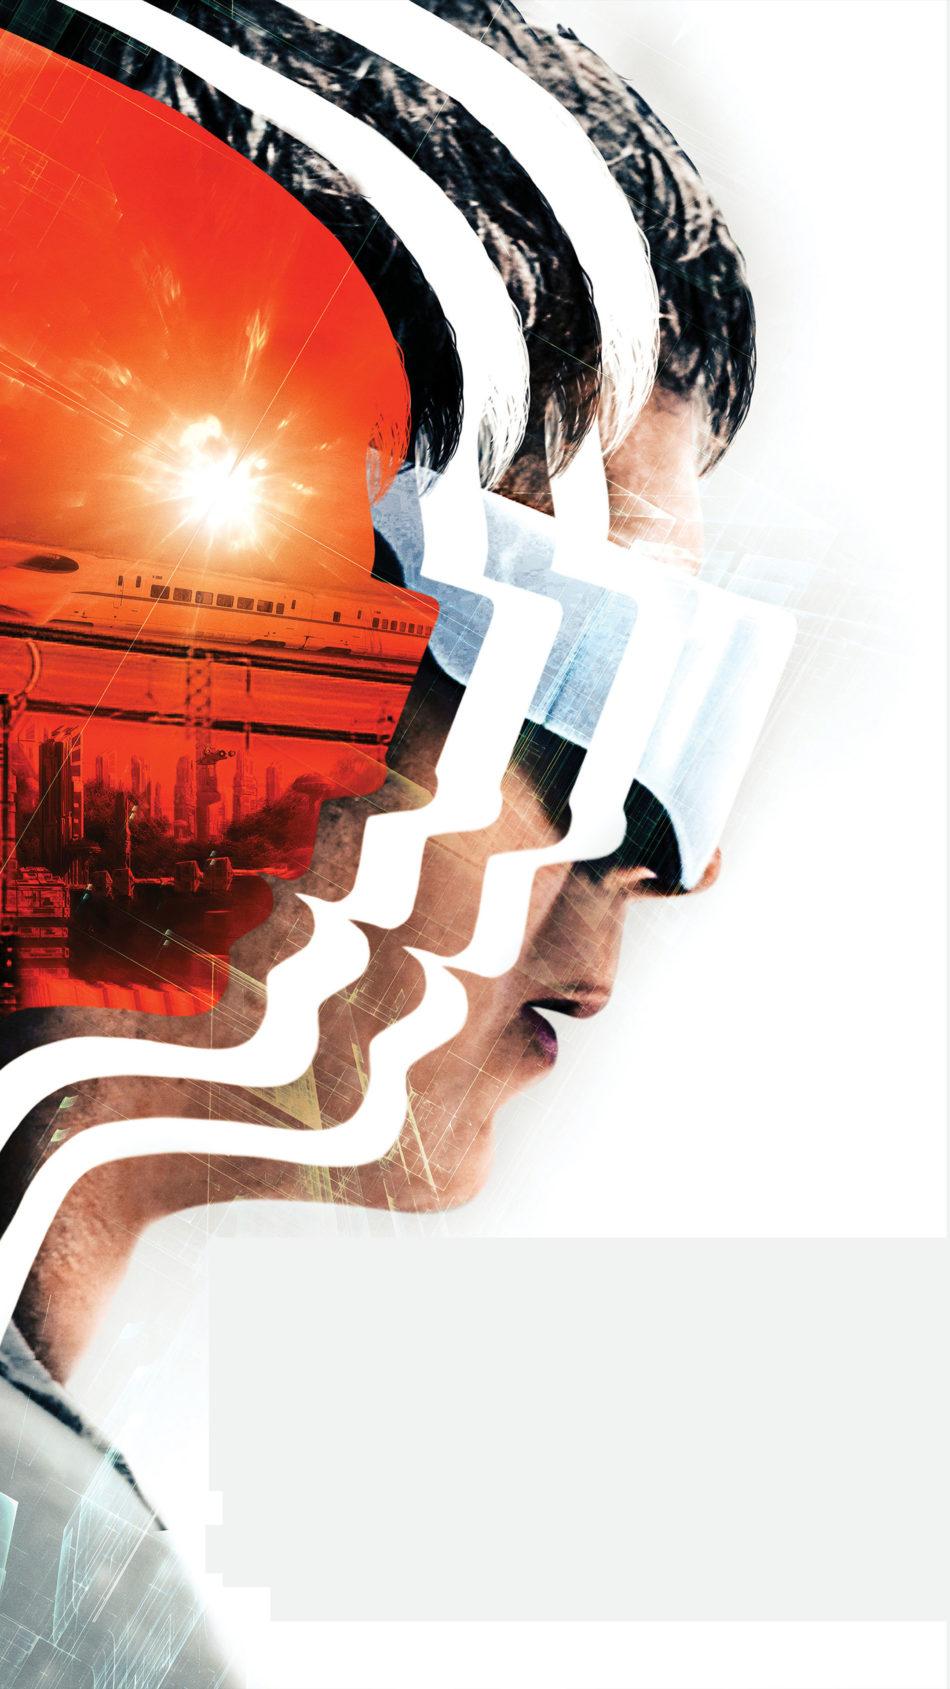 LX 2048 Poster 4K Ultra HD Mobile Wallpaper